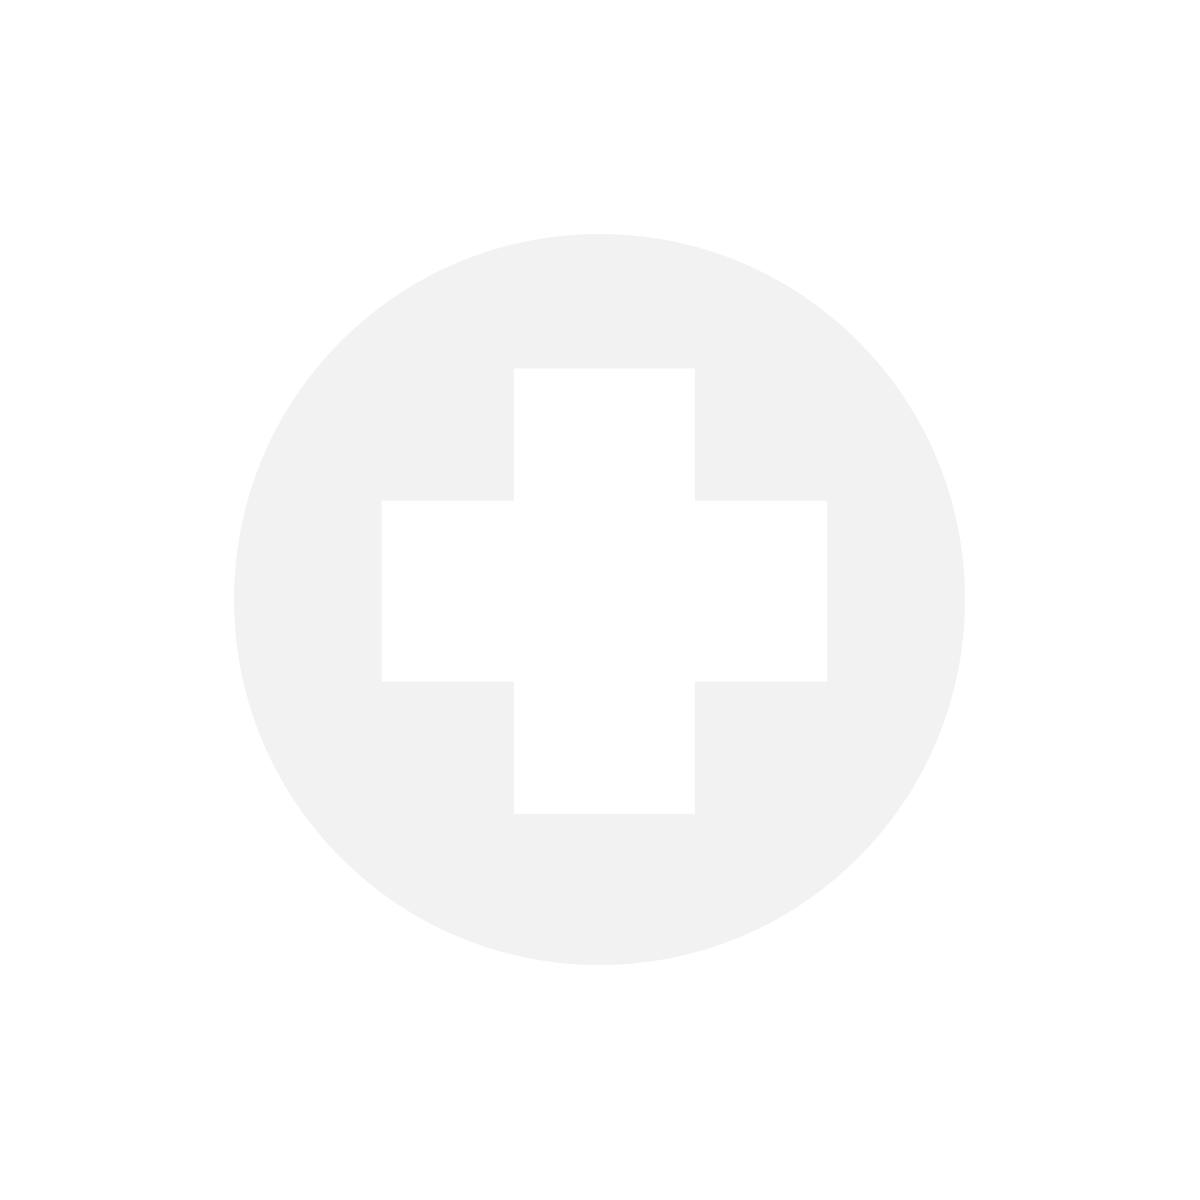 Batterie Globus pour Magnum / Medisound pro II / Activa / Genesy